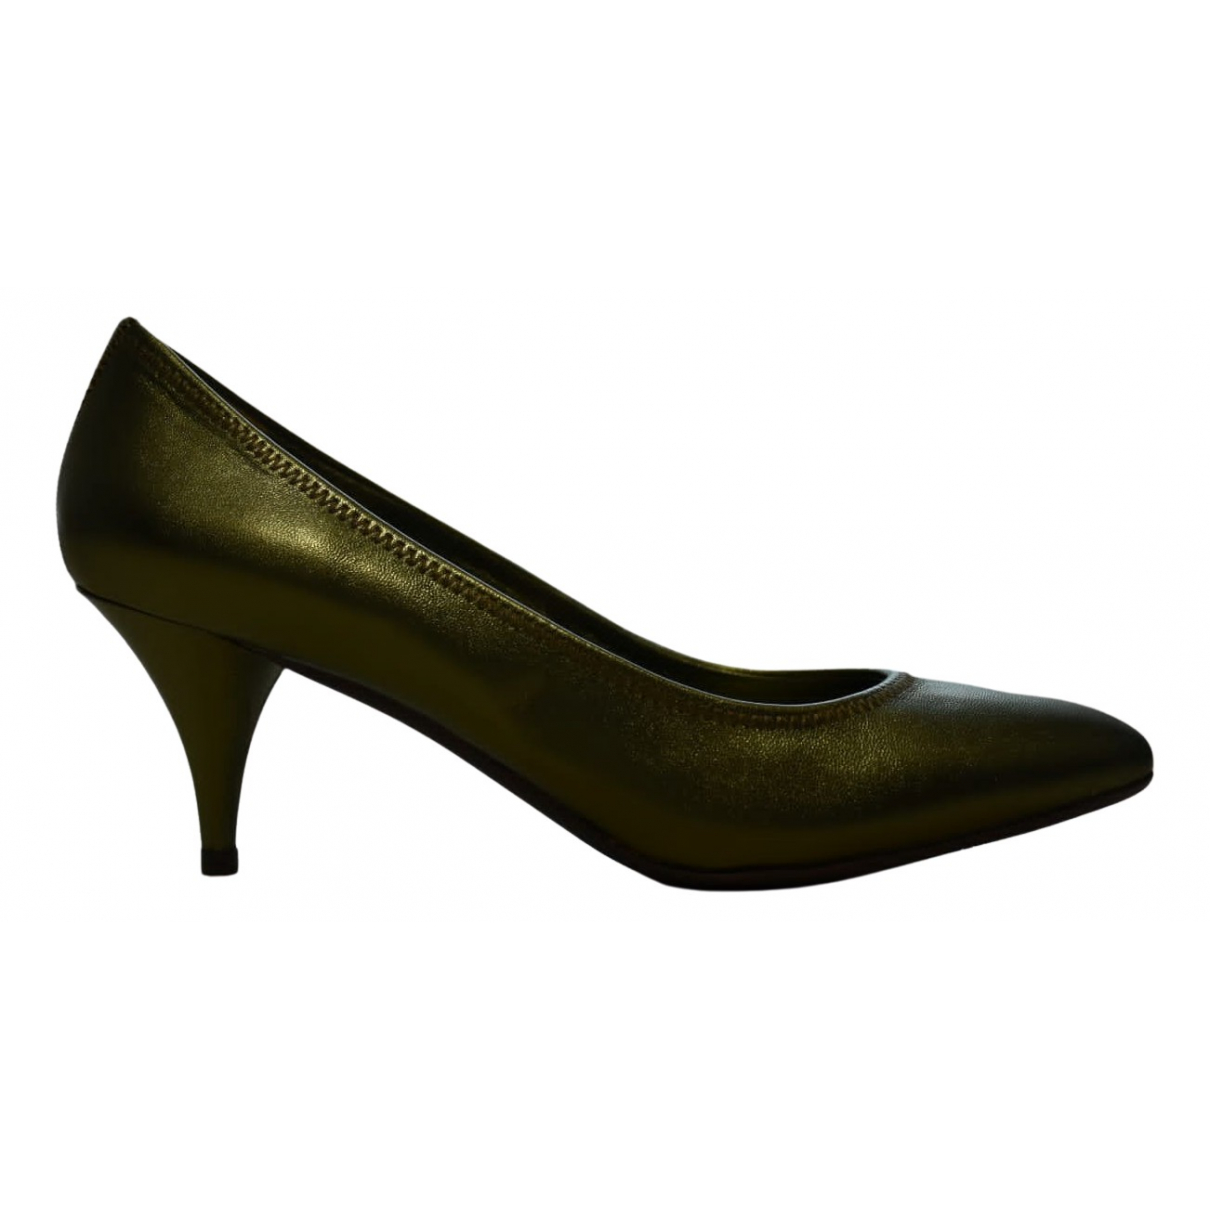 Prada N Green Leather Heels for Women 37.5 EU